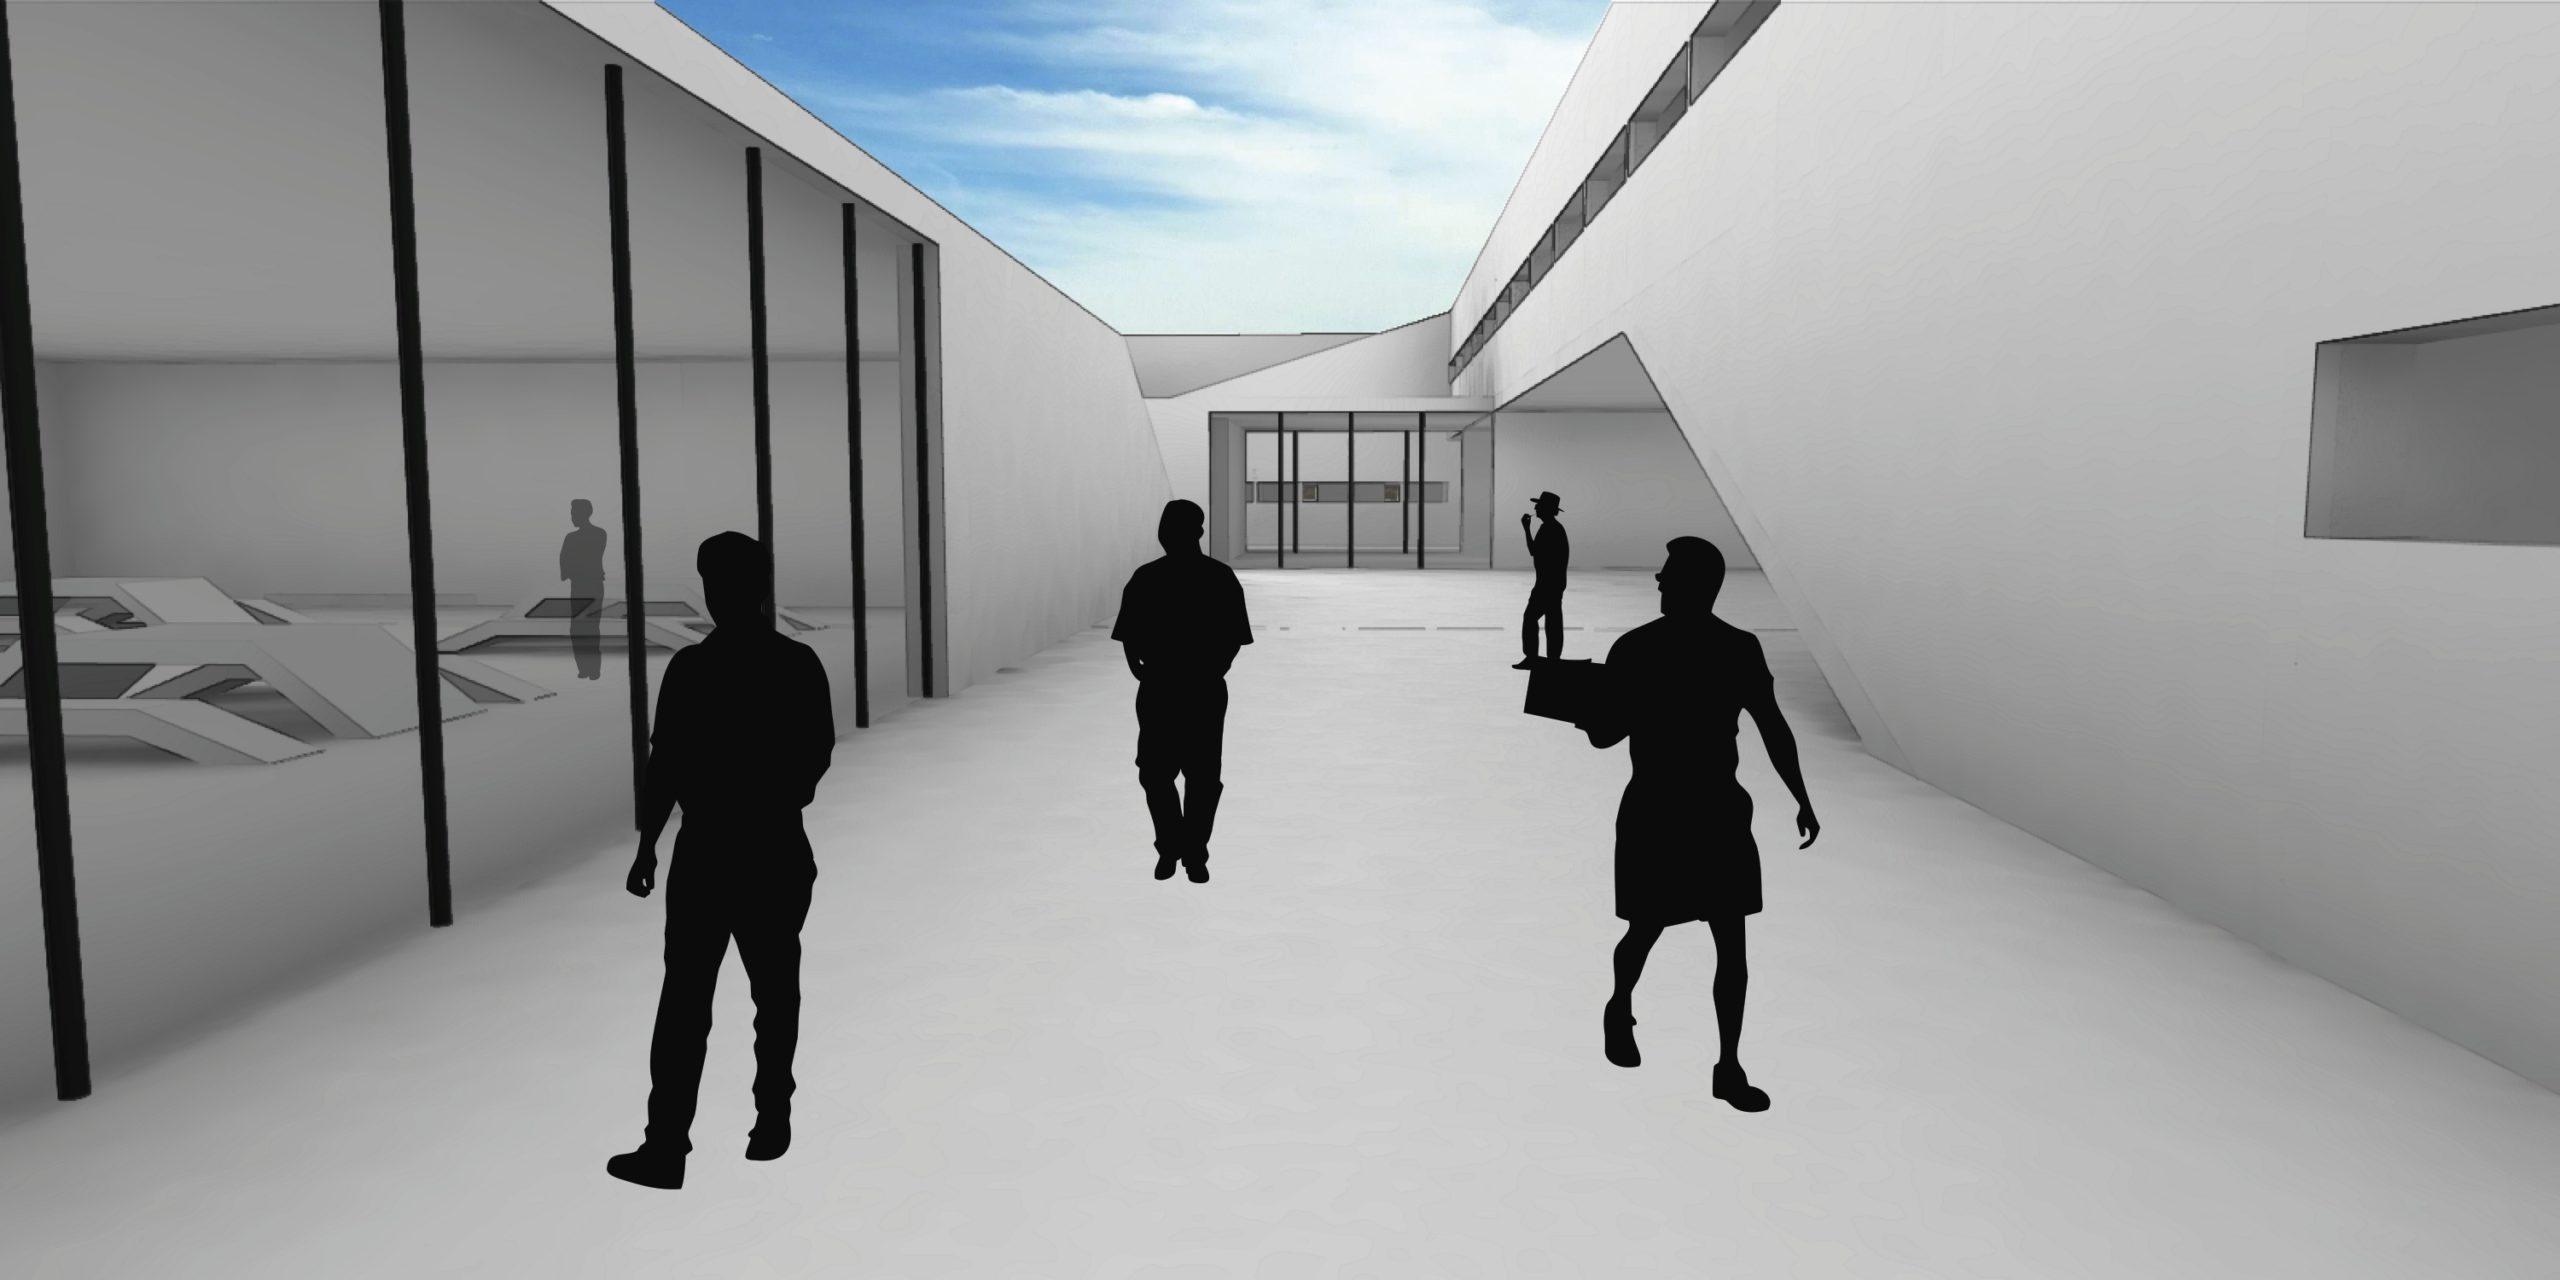 mikrokosmos prison rendering 3